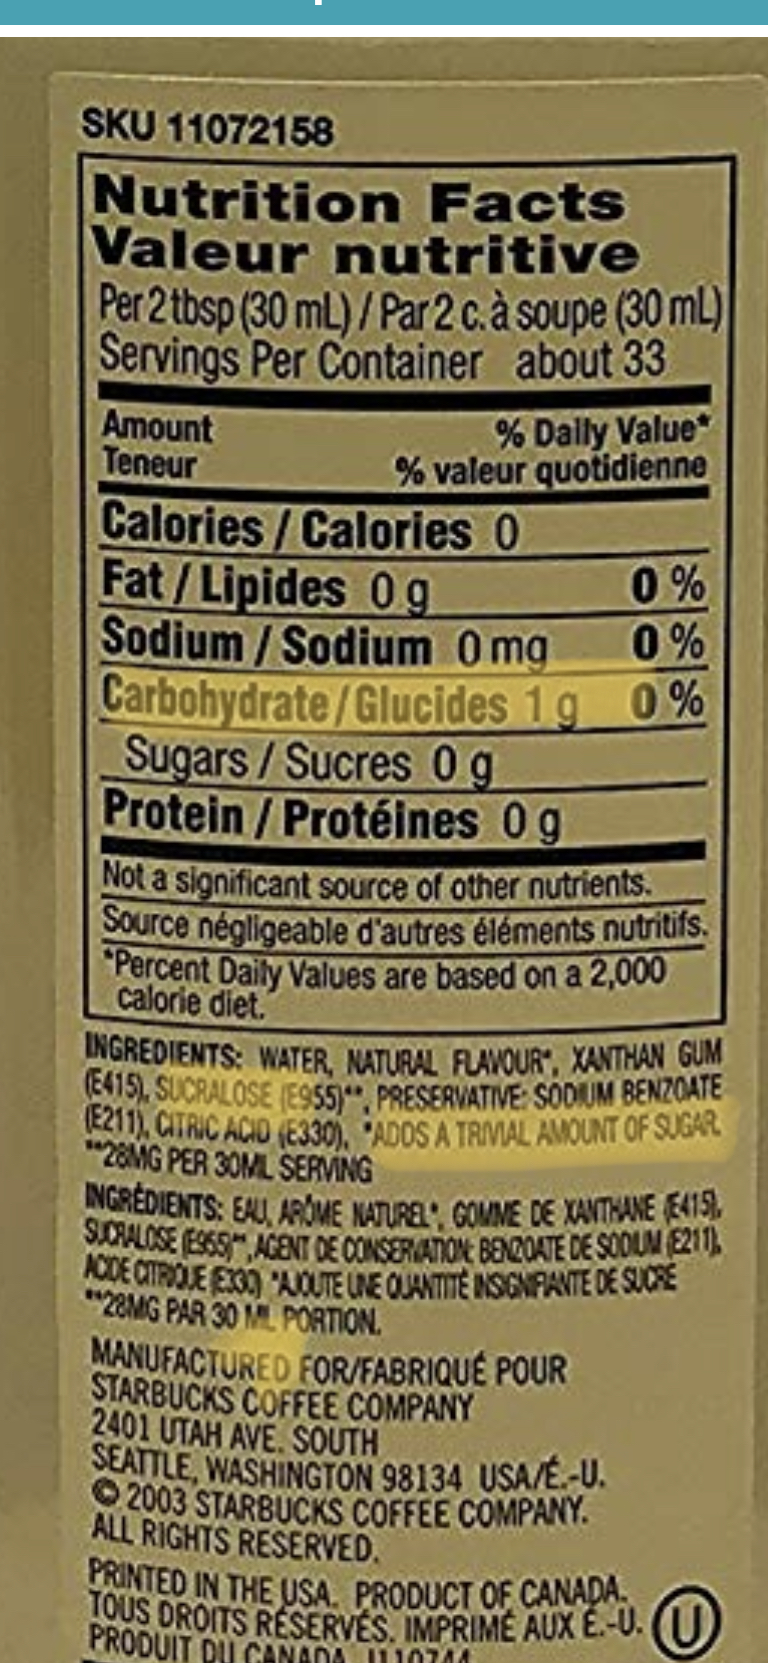 Sugar Free Cinnamon Dolce Syrup